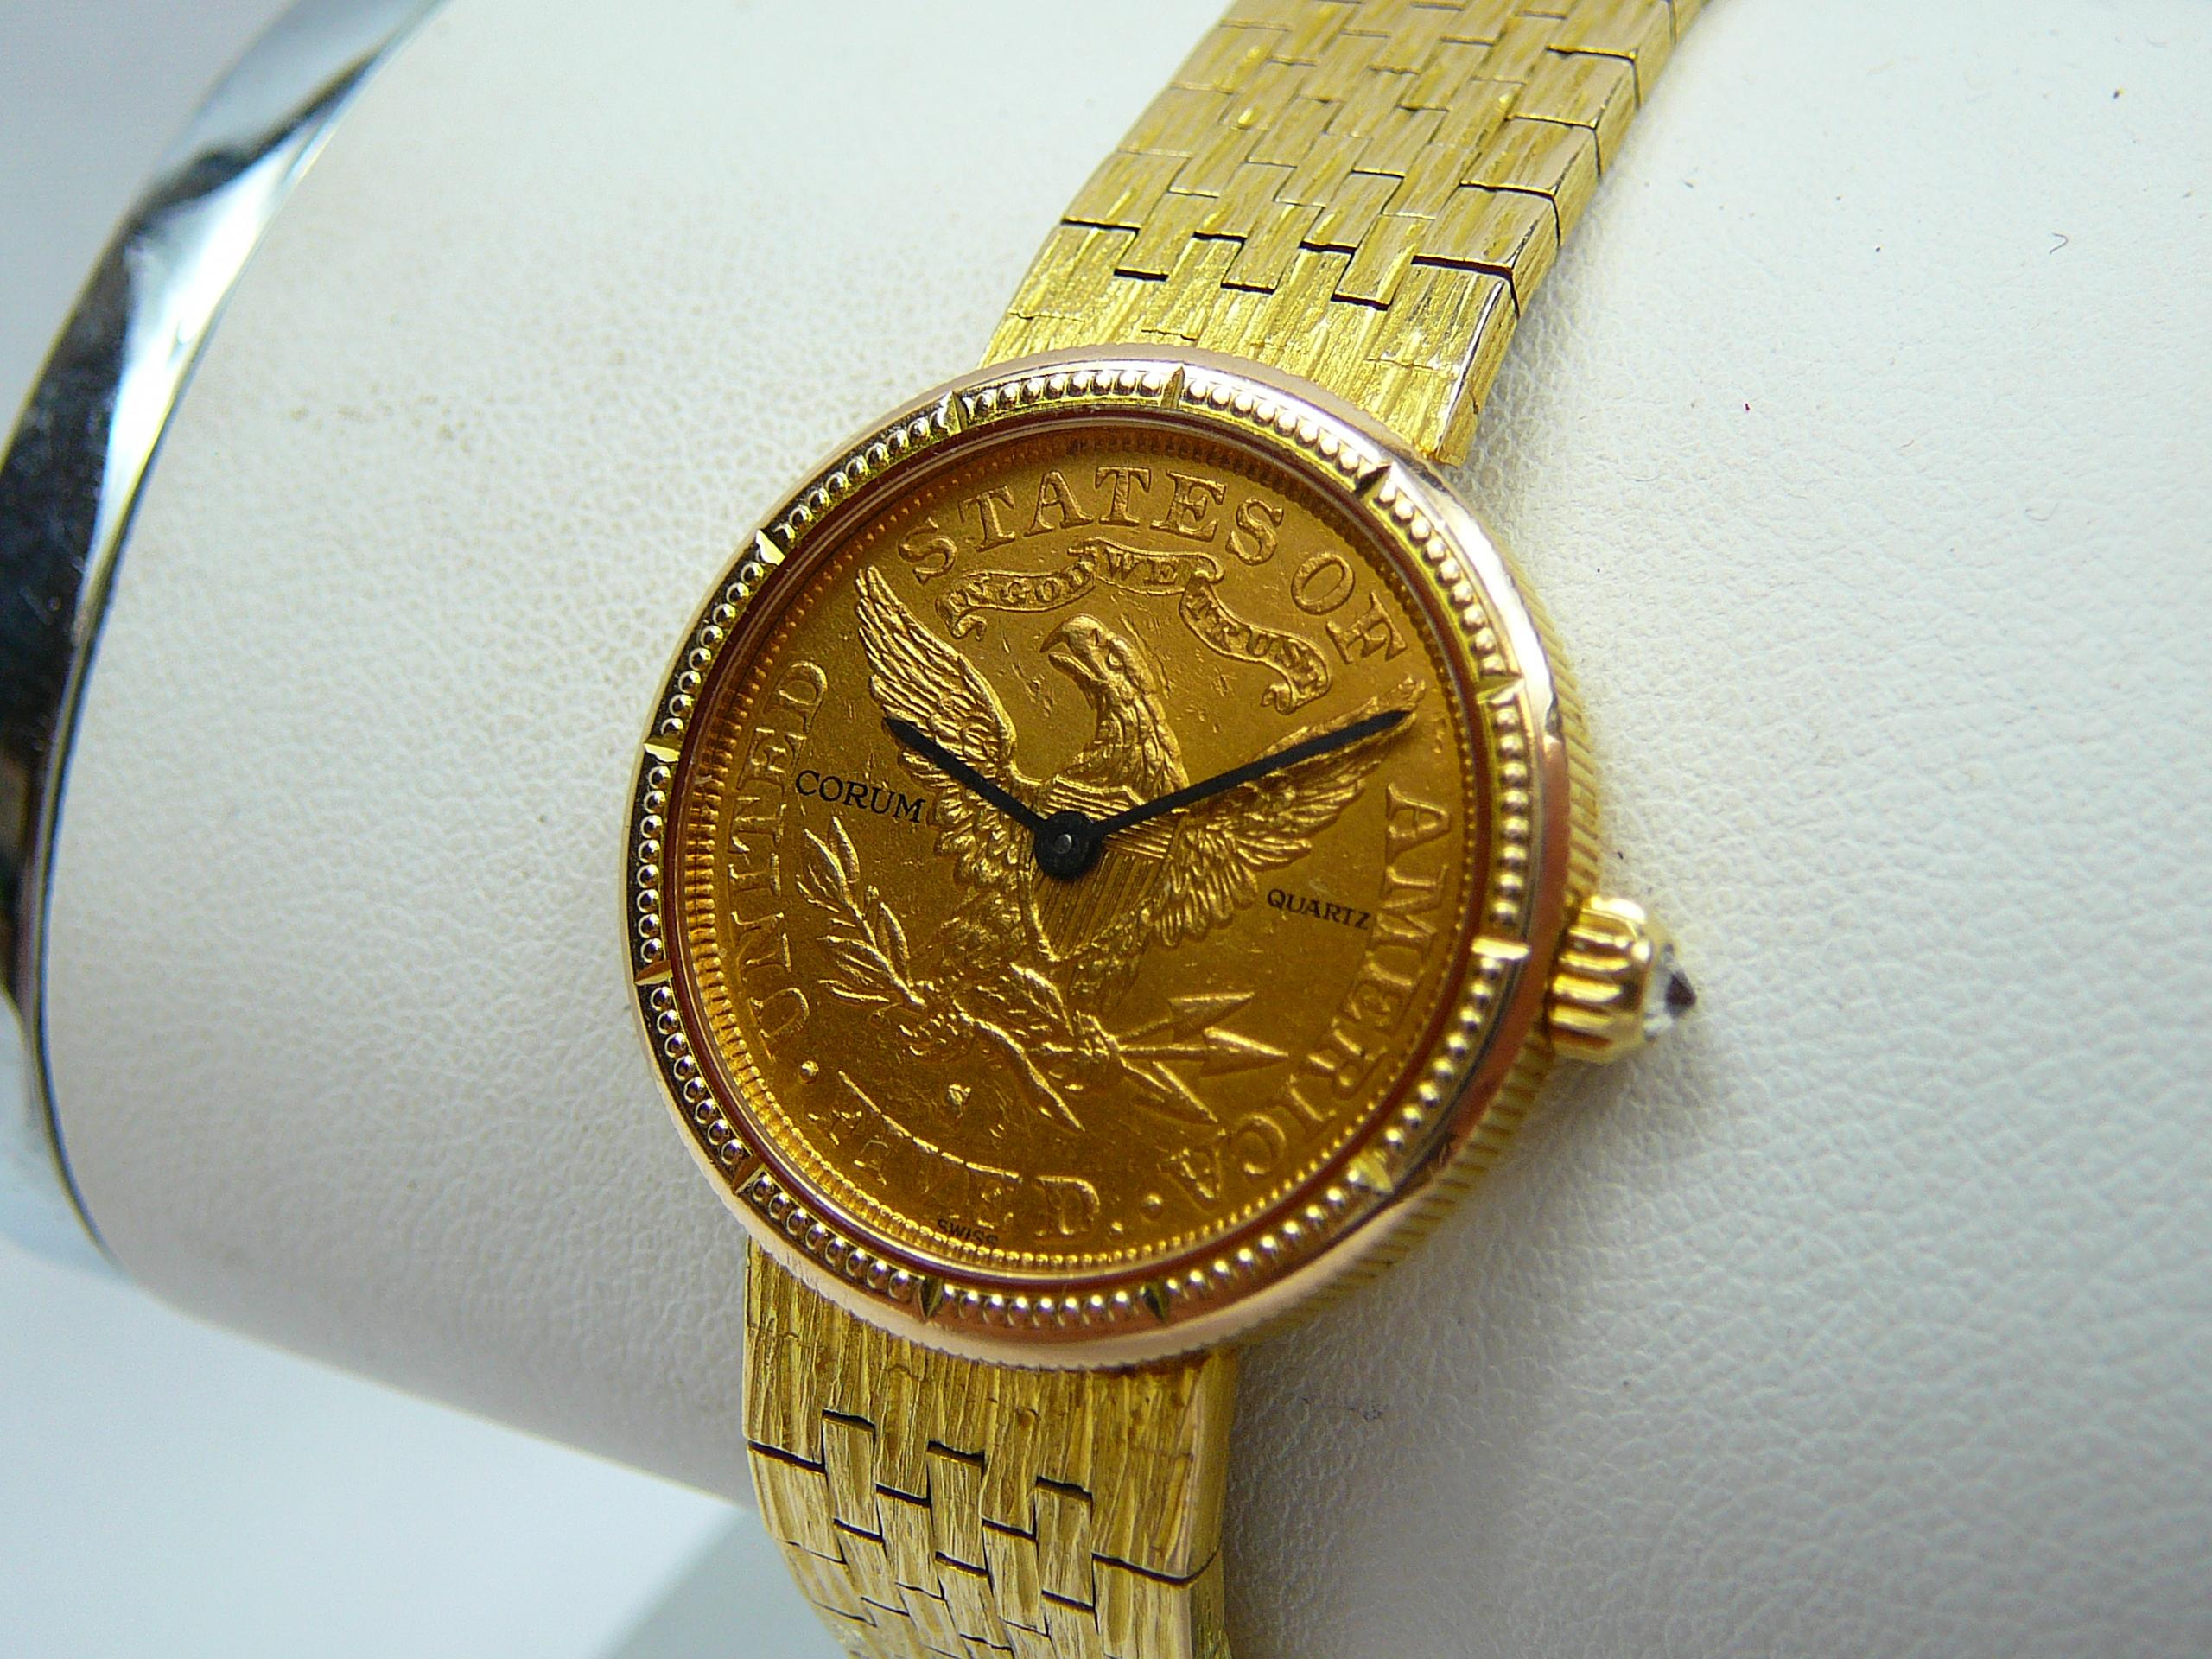 Ladies Gold Corum Wrist Watch - Image 2 of 3